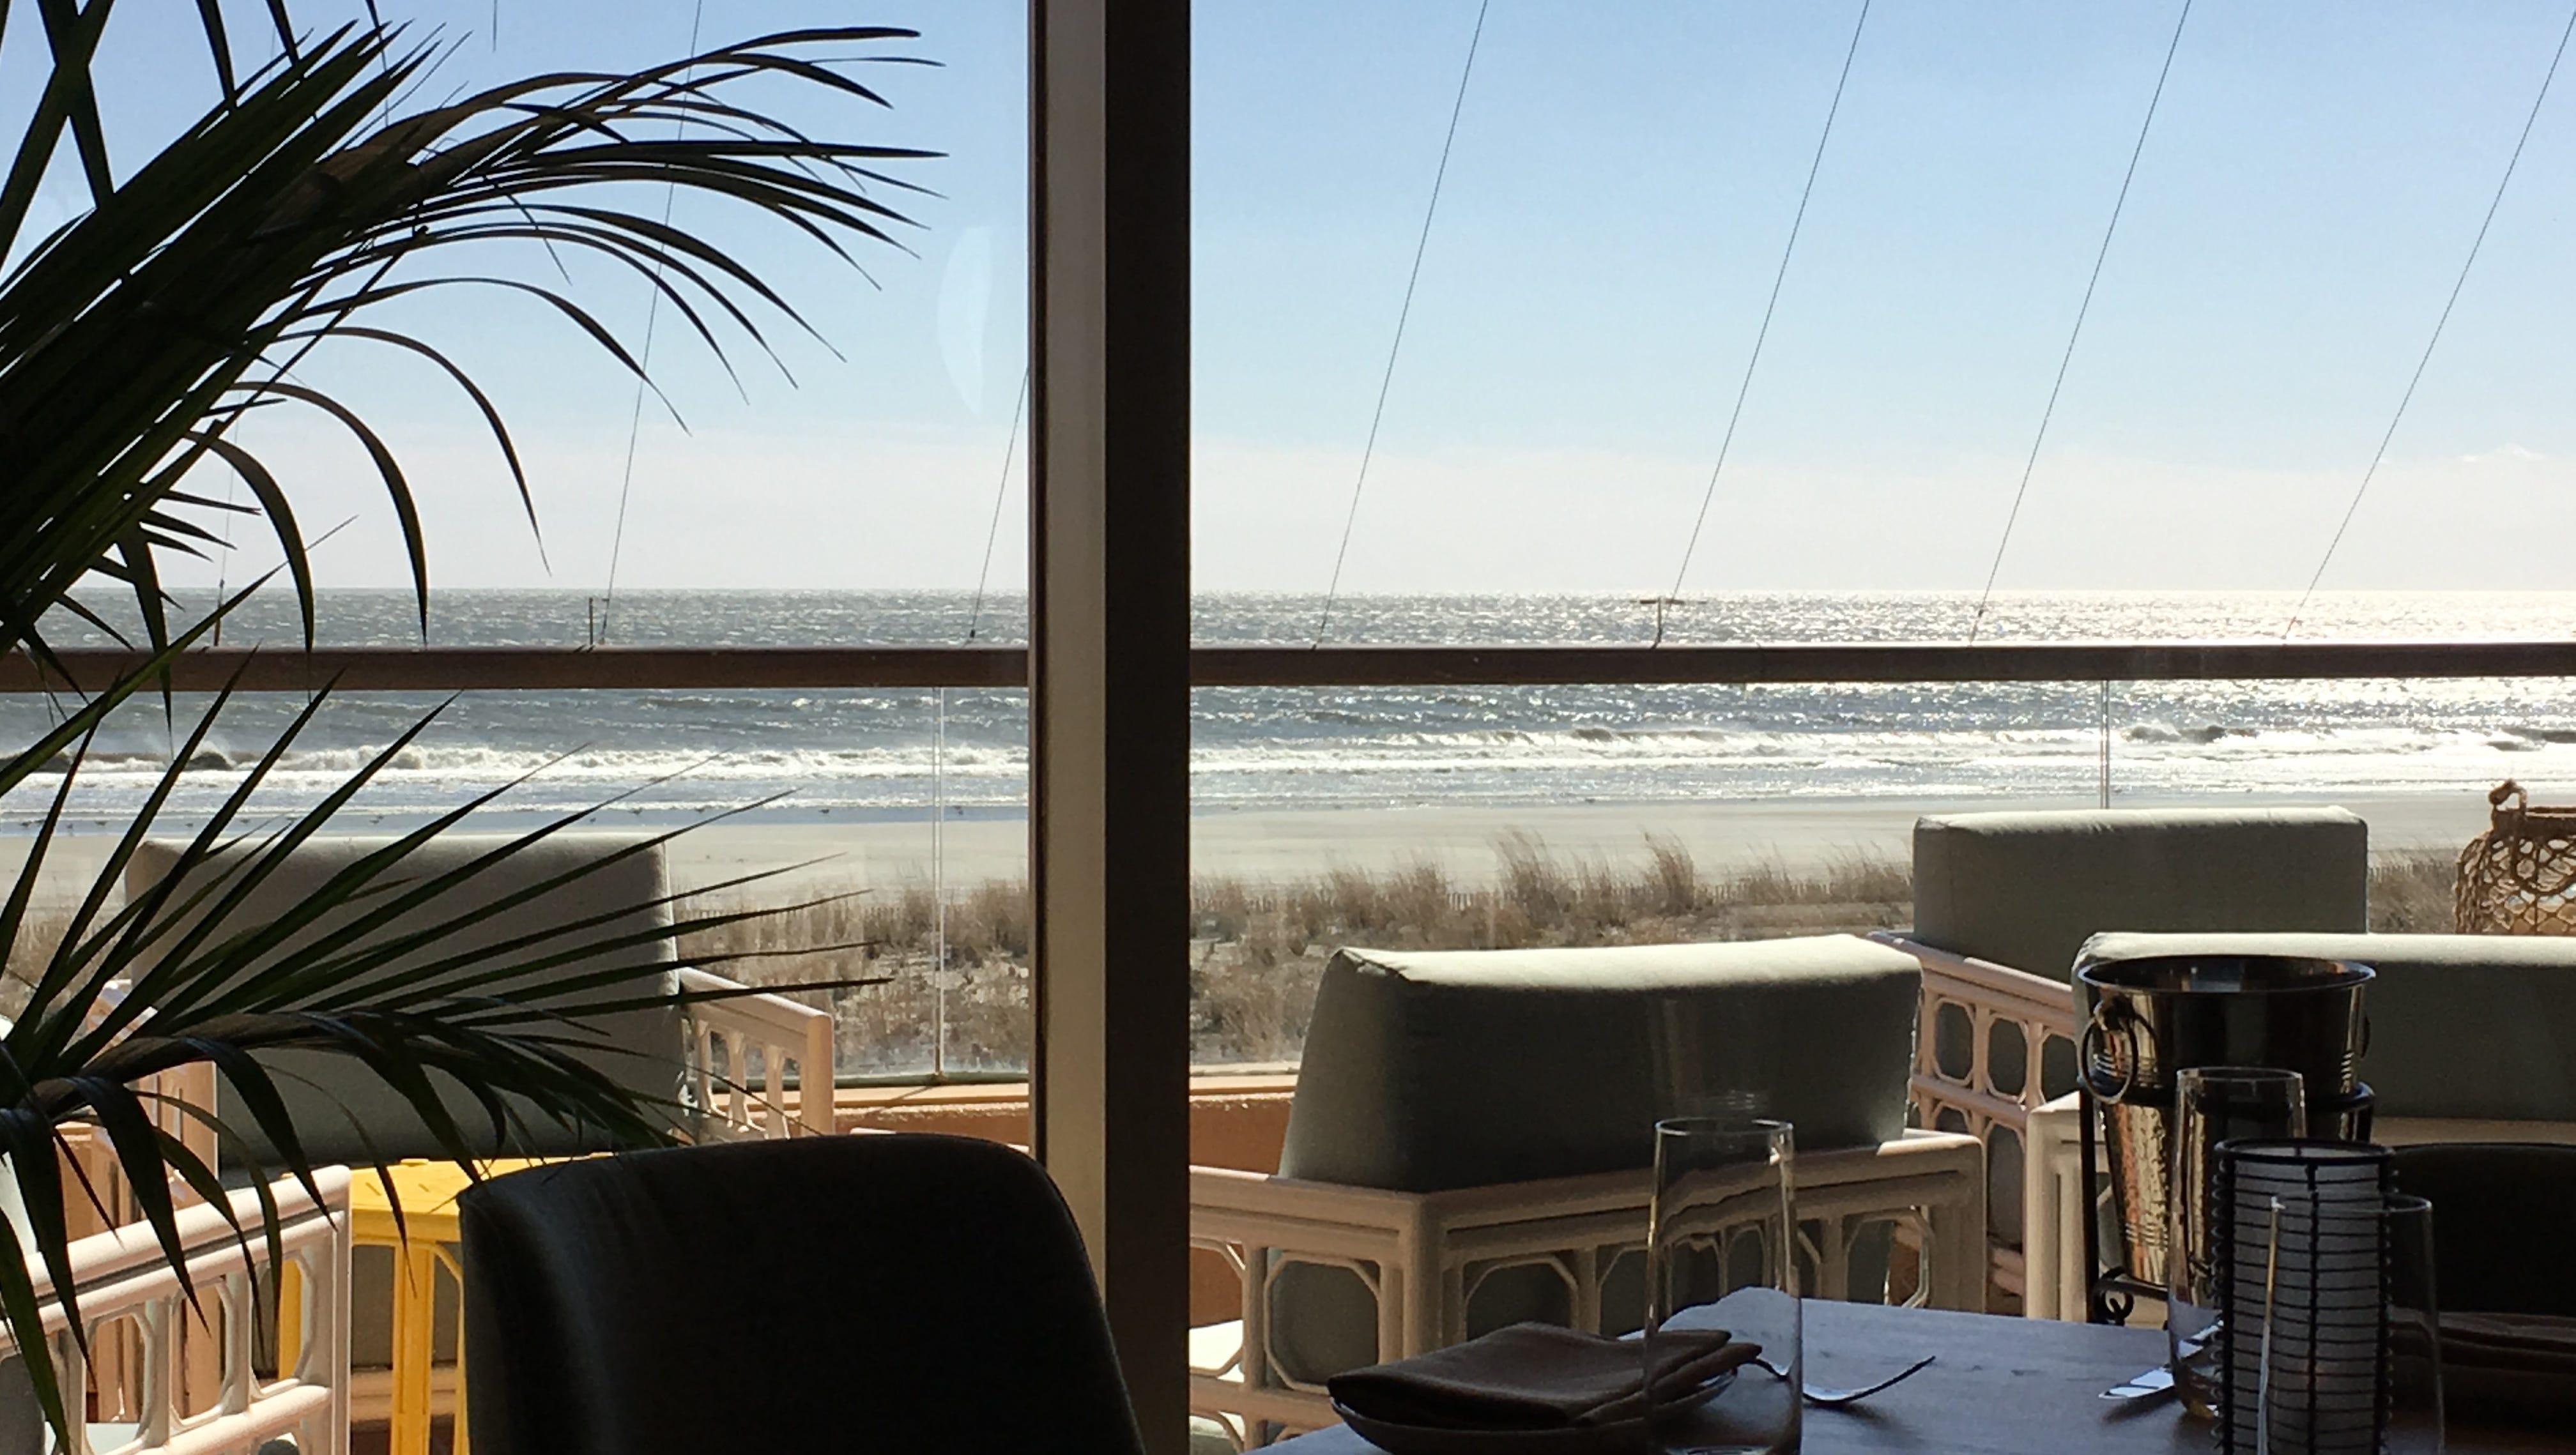 11 Nj Restaurants With Great Views